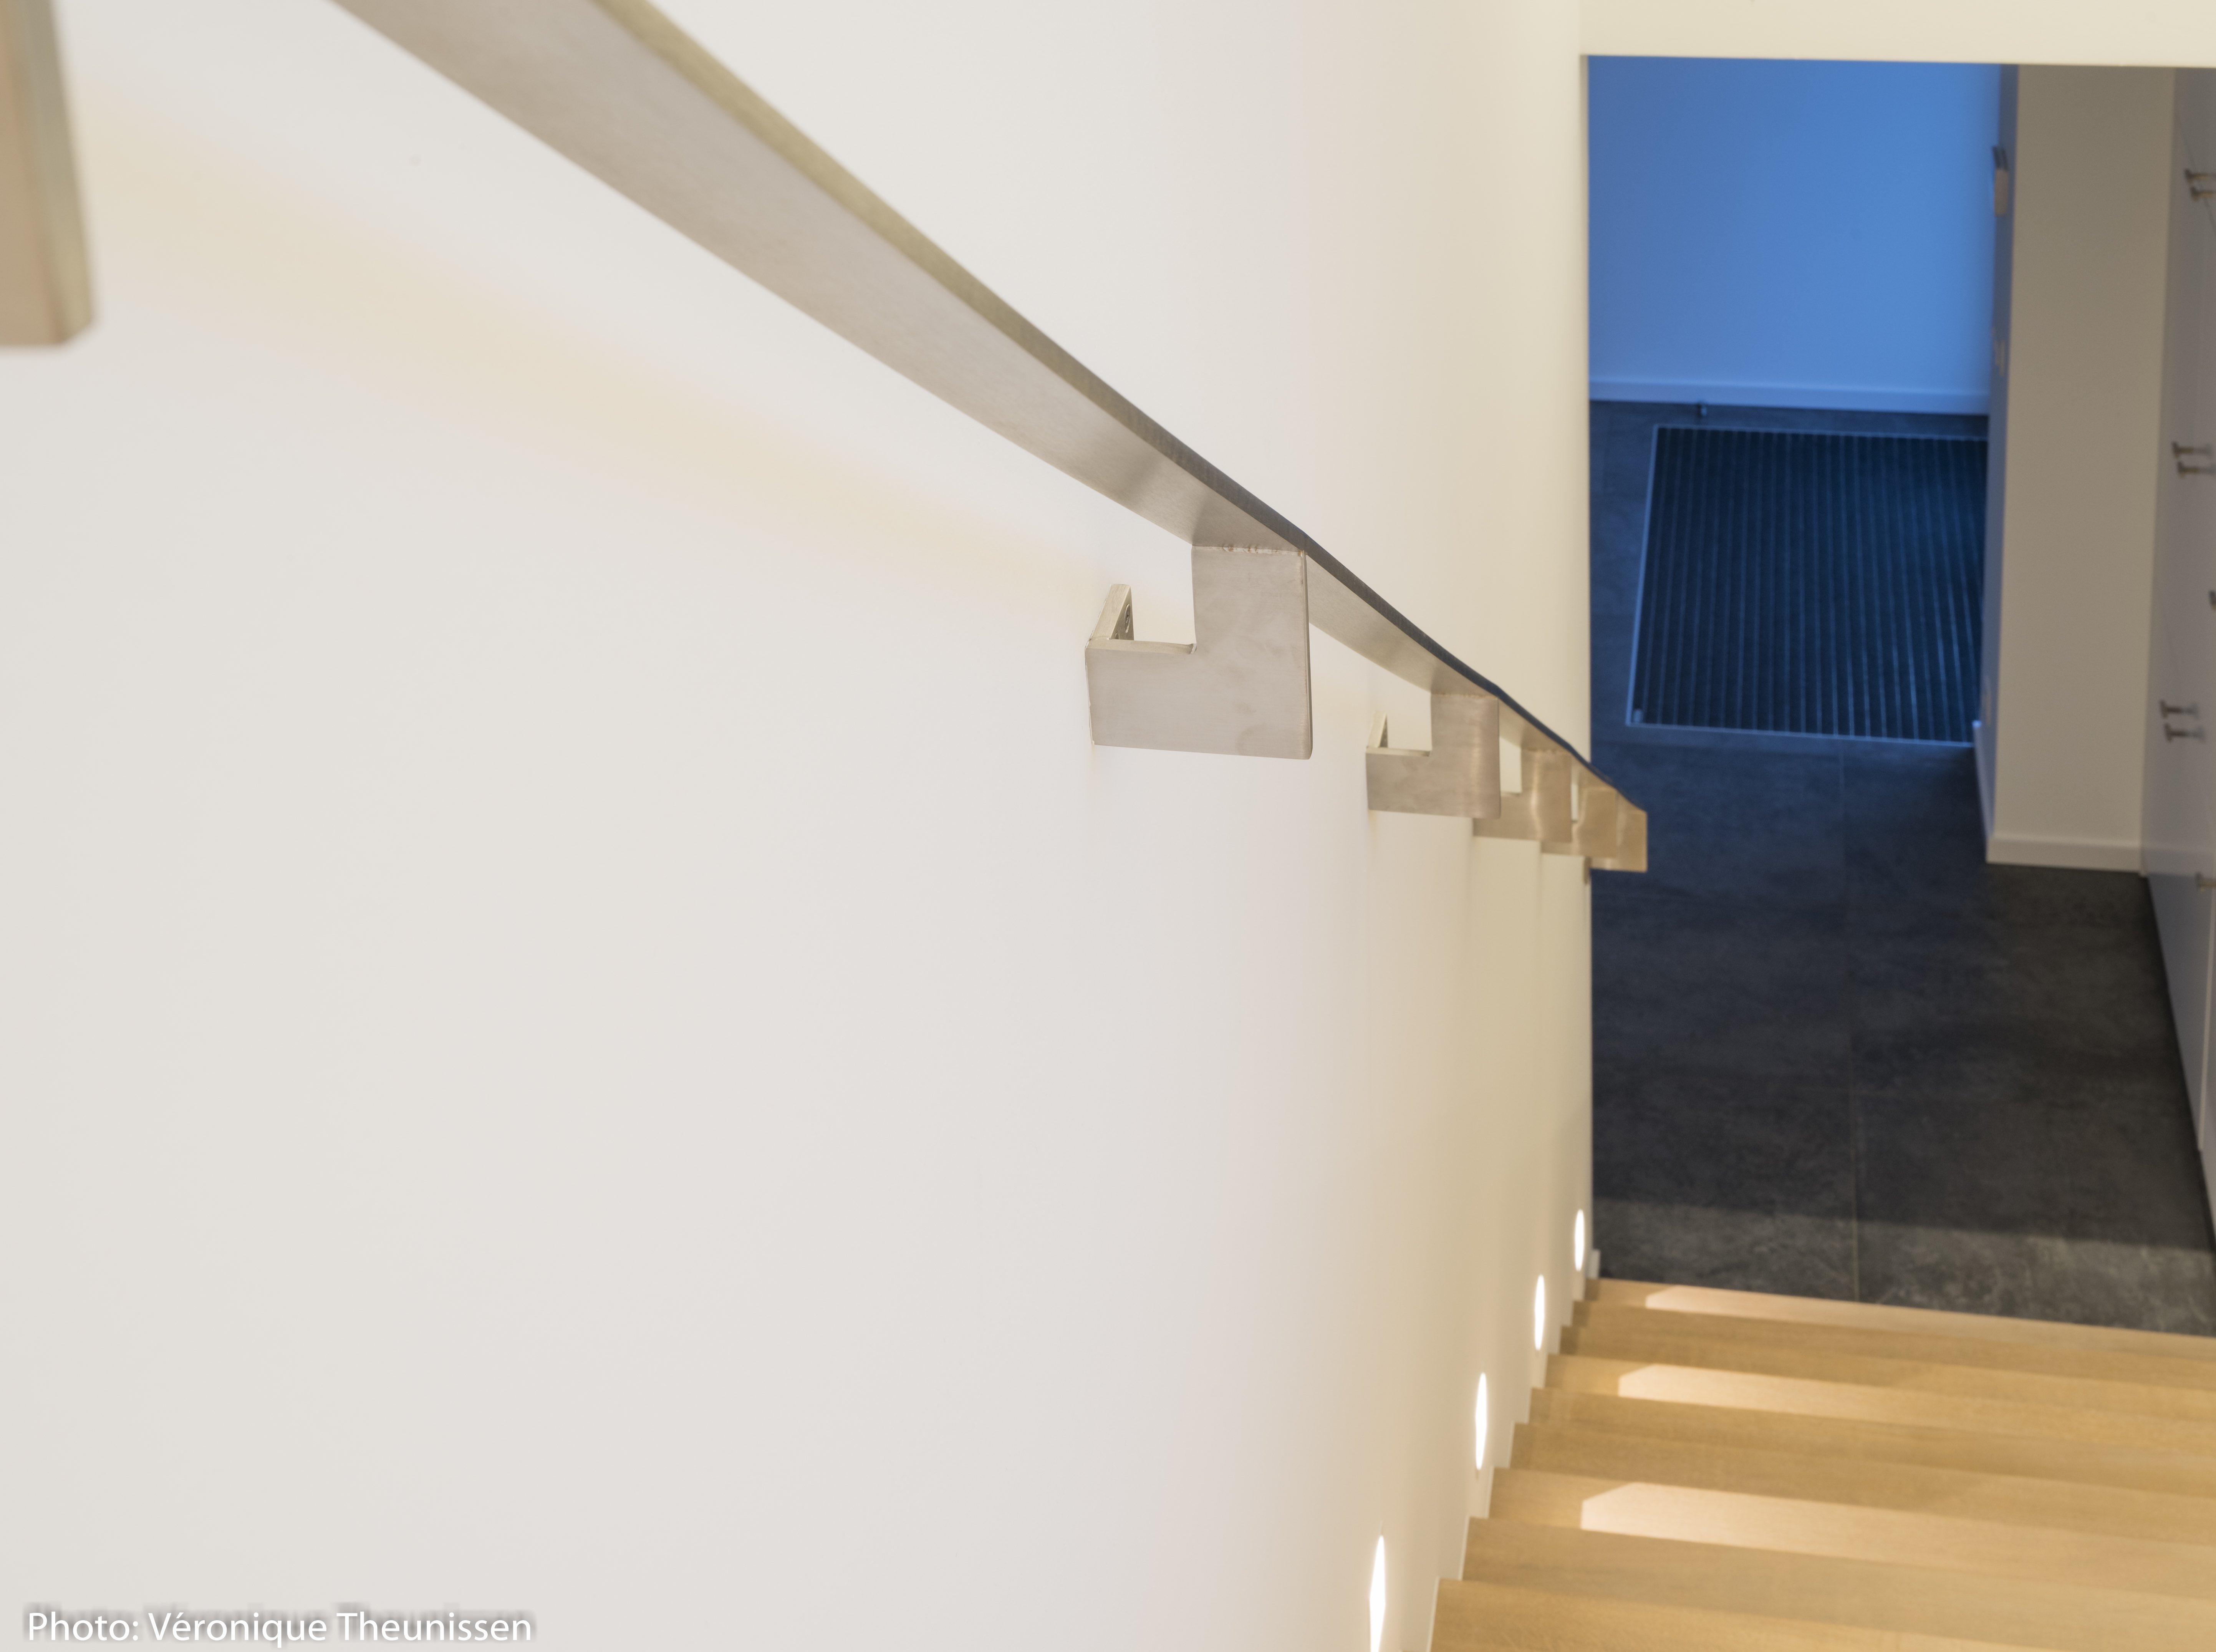 LCK PROJECTS OLIVIA LANCKSWEERT Architecture intérieur Bruxelles Brussels EQUIPE Team